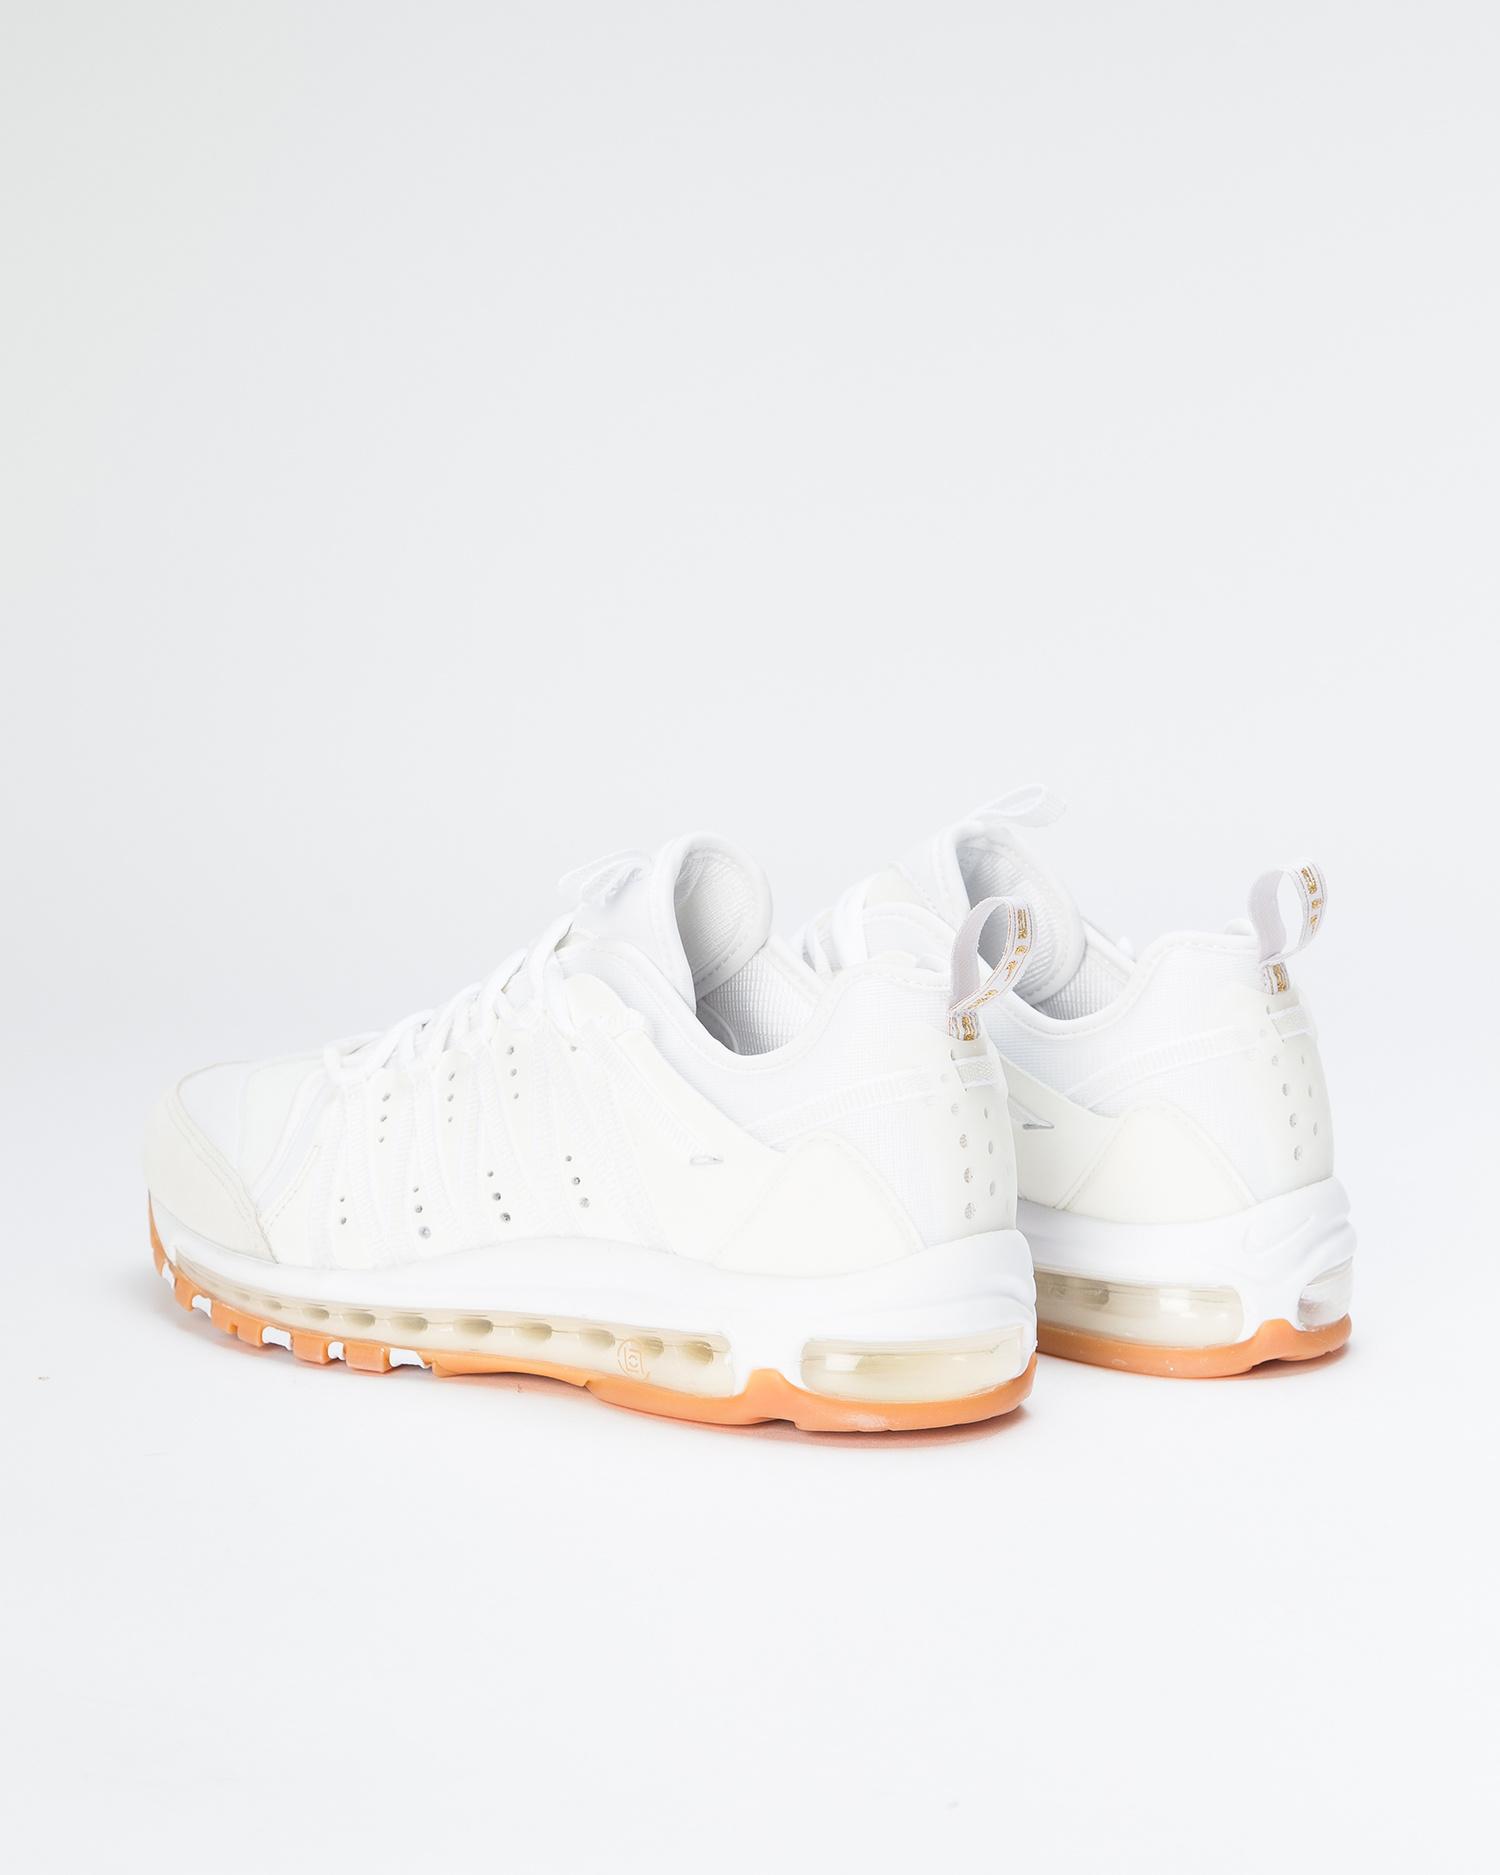 Nike x CLOT Air Max Haven WHITE/OFF WHITE-SAIL